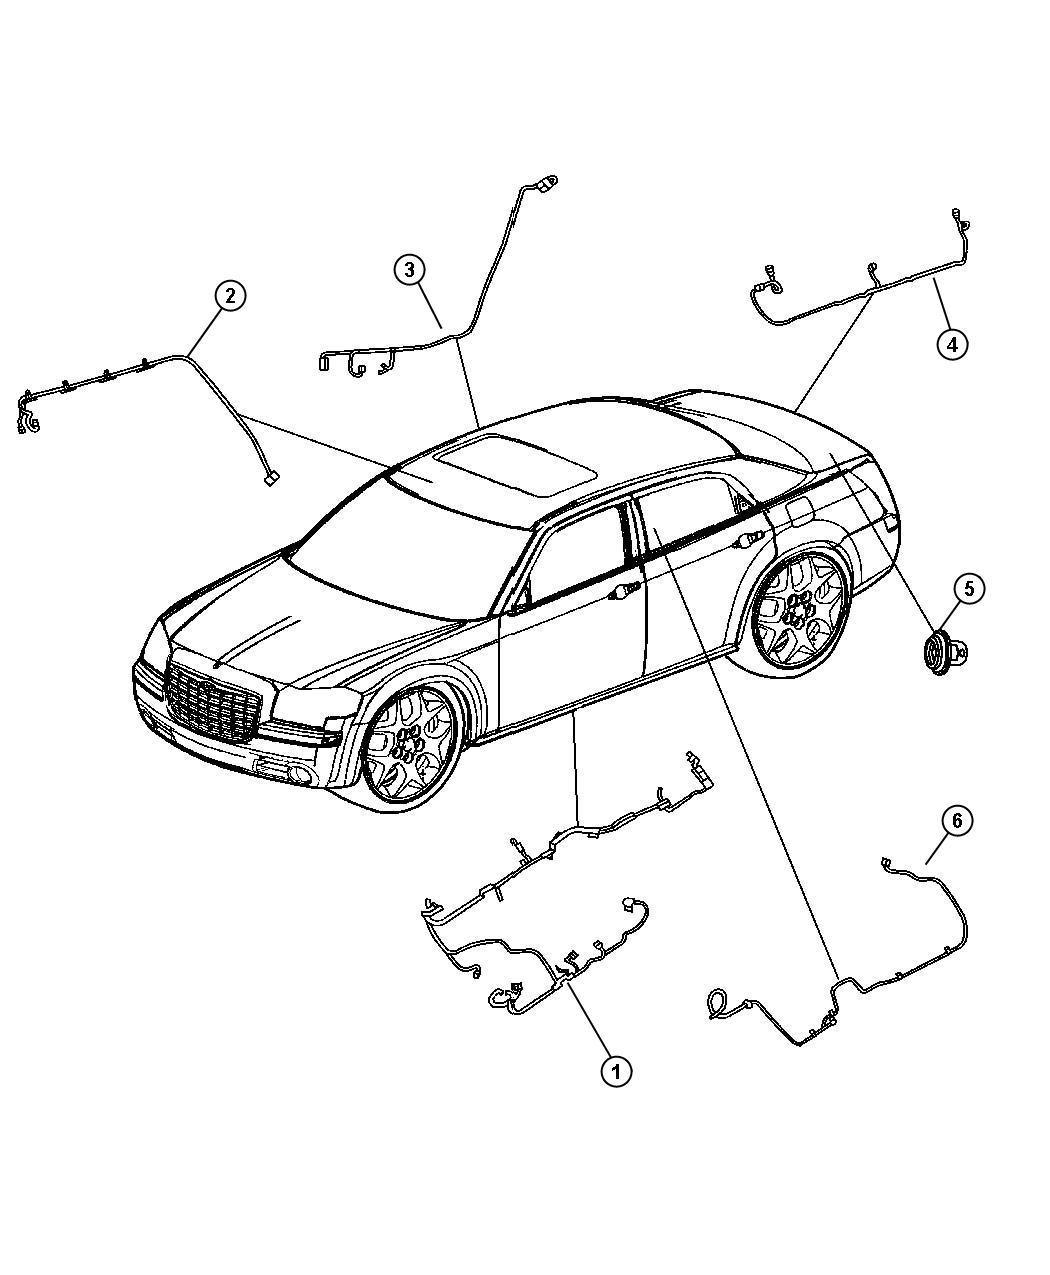 chrysler rear view mirror wiring diagram